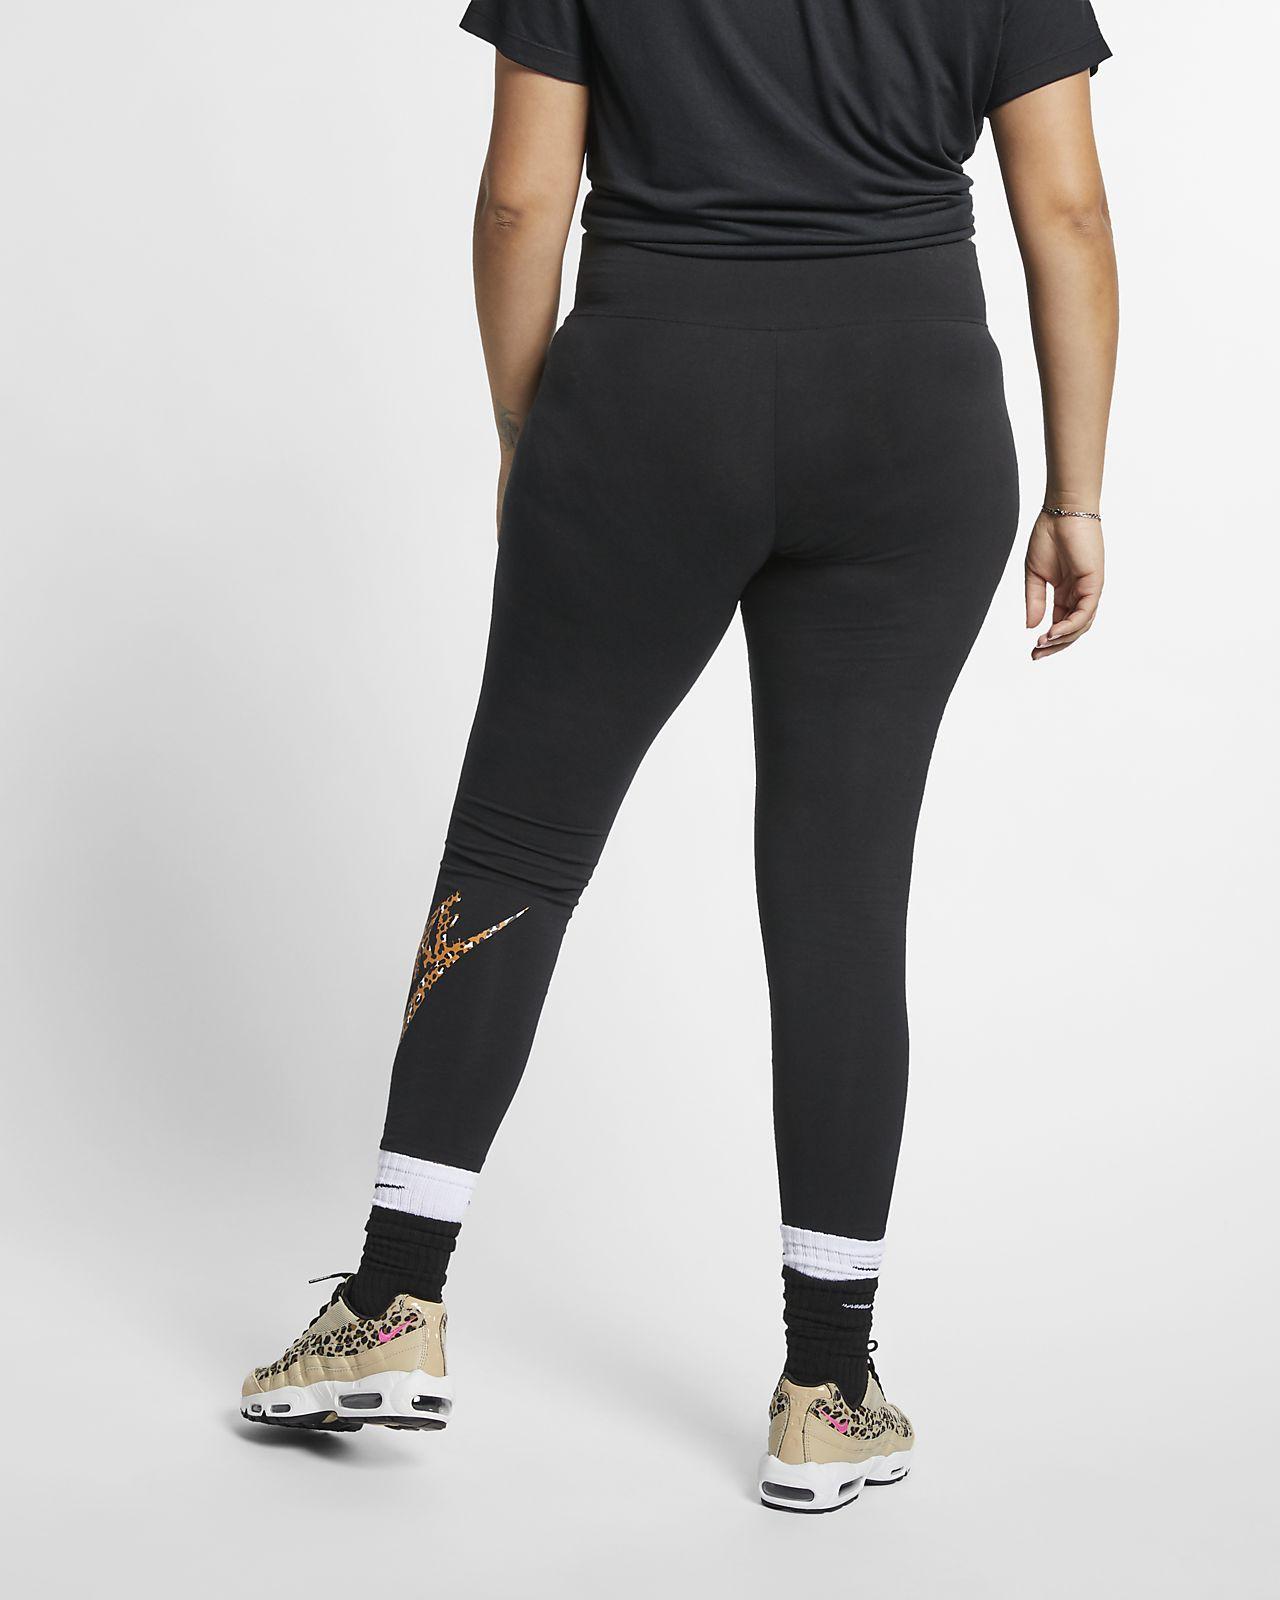 Sportswear Nike Dameslegginggrote Nike MatenBe Sportswear Nike Dameslegginggrote Dameslegginggrote Sportswear MatenBe Y6ybfg7